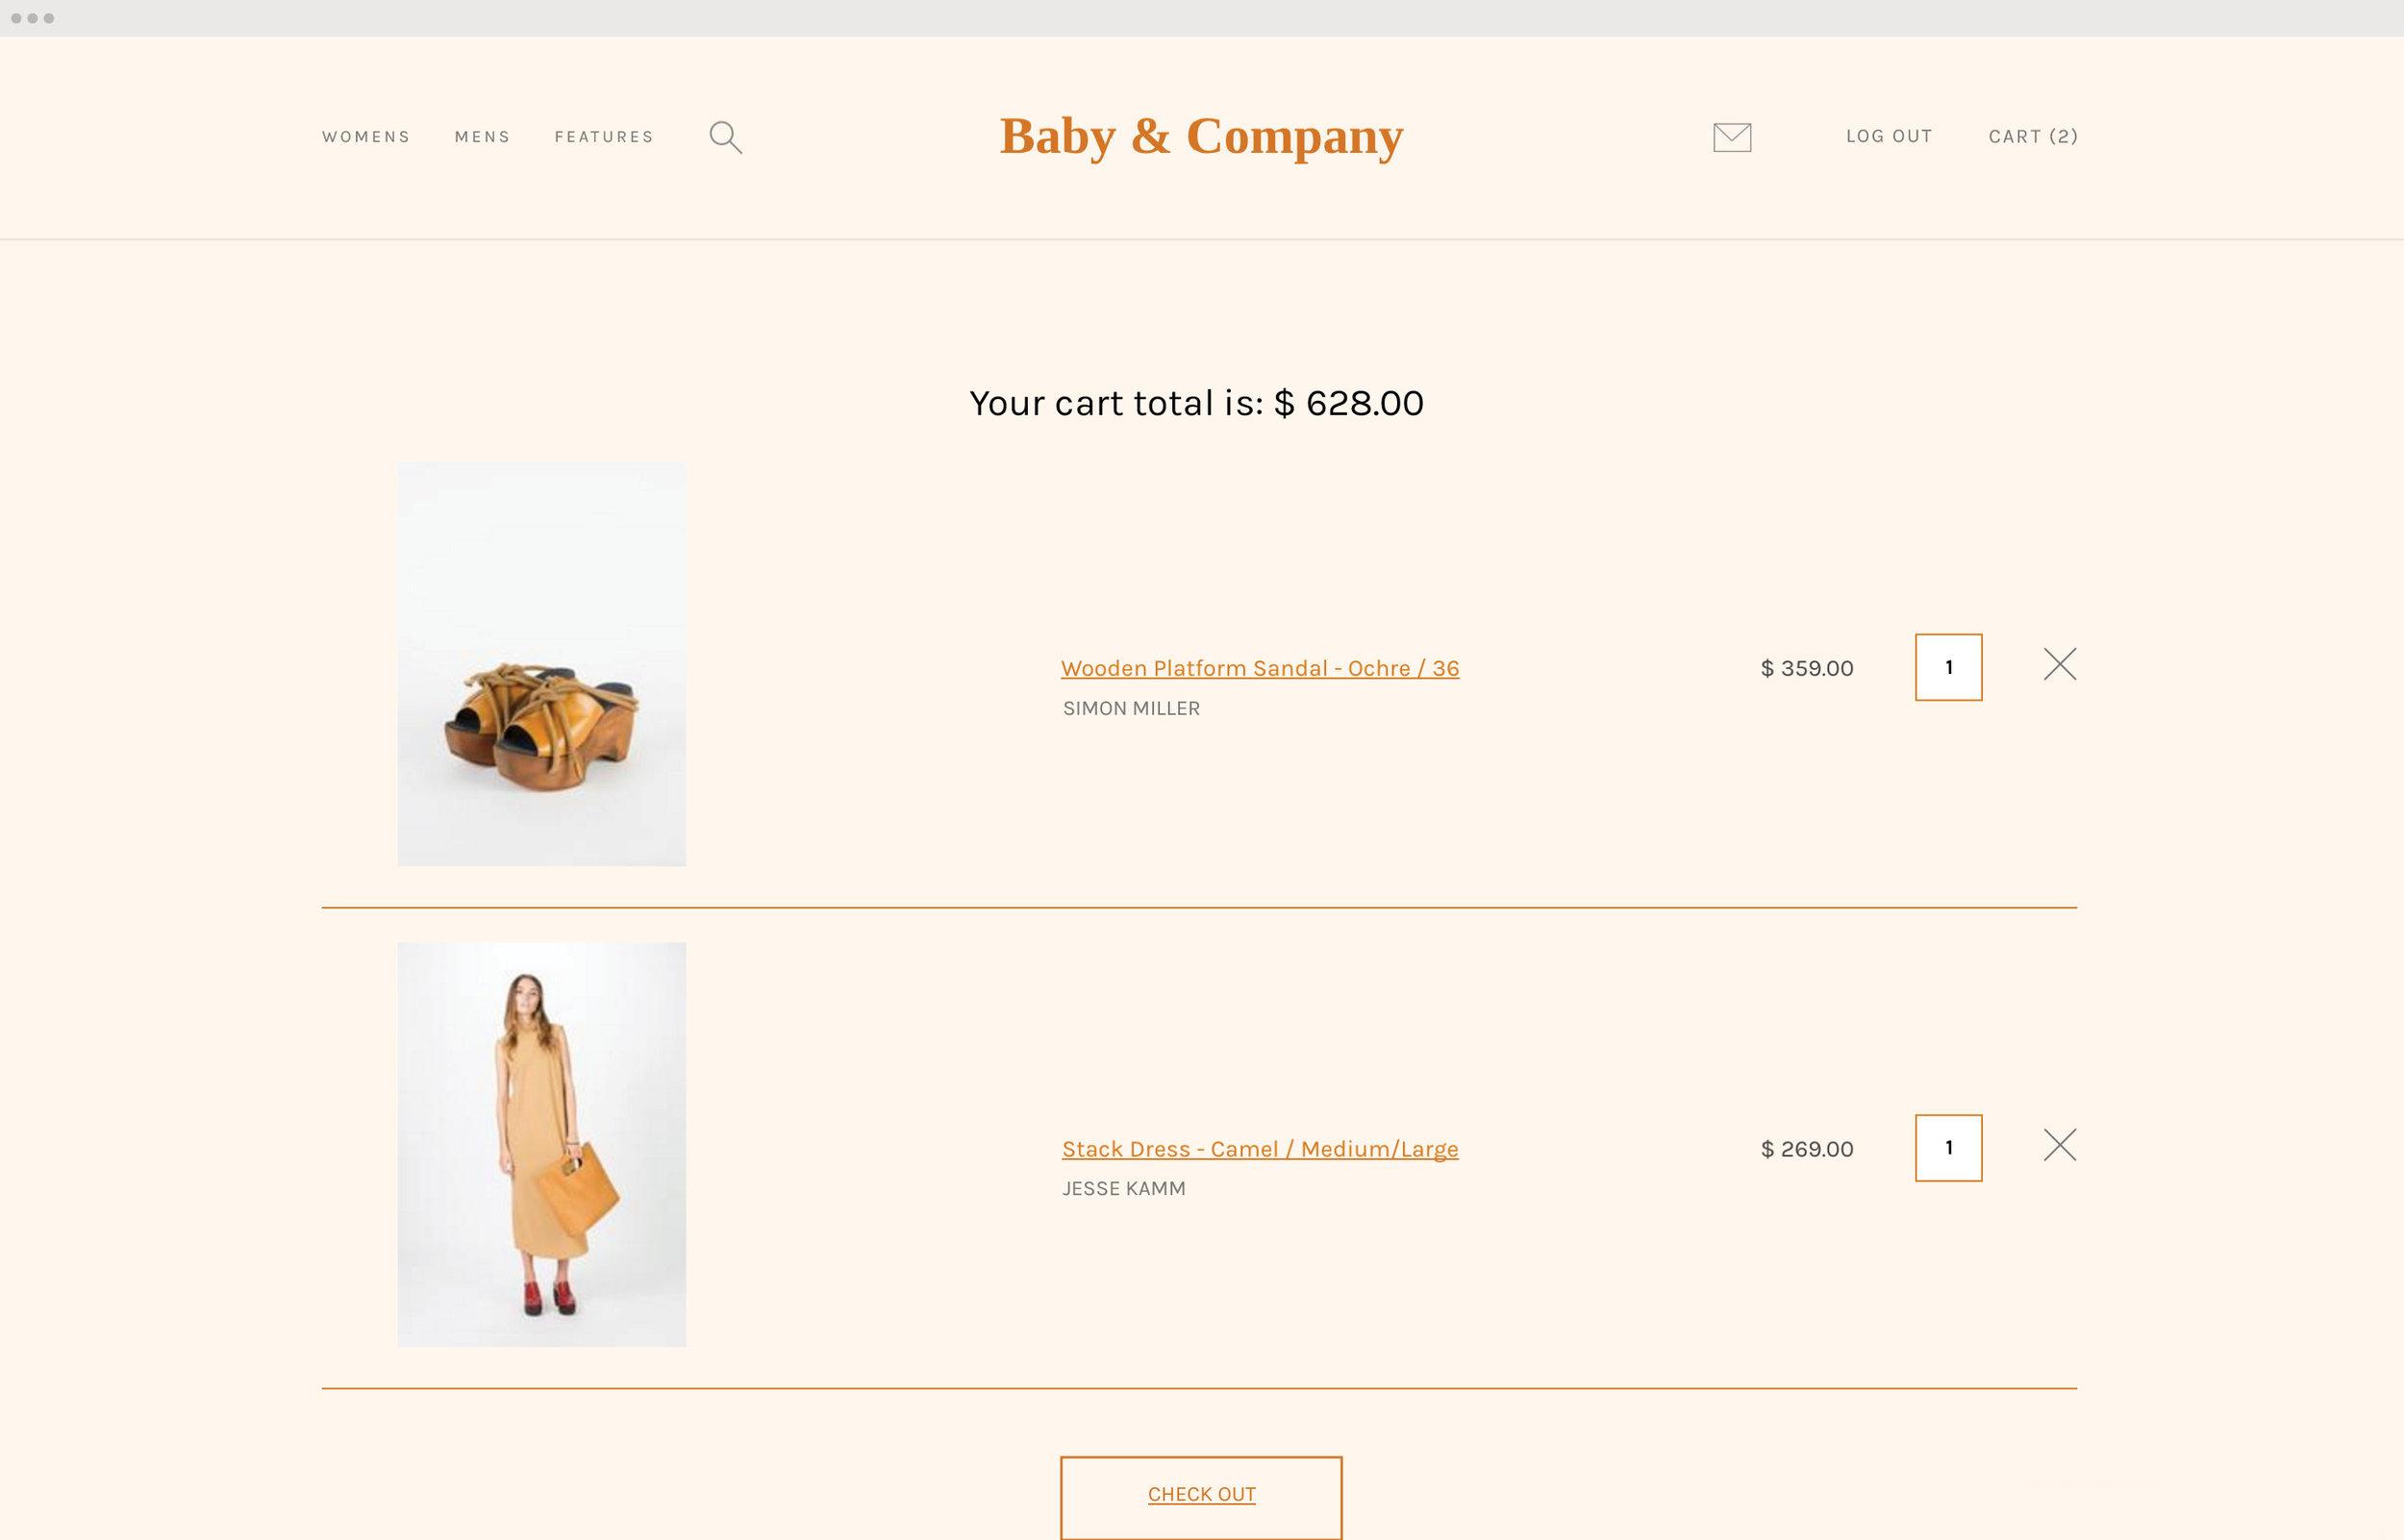 Web Tiles_2019_Web Design - B&C site customization14.jpg